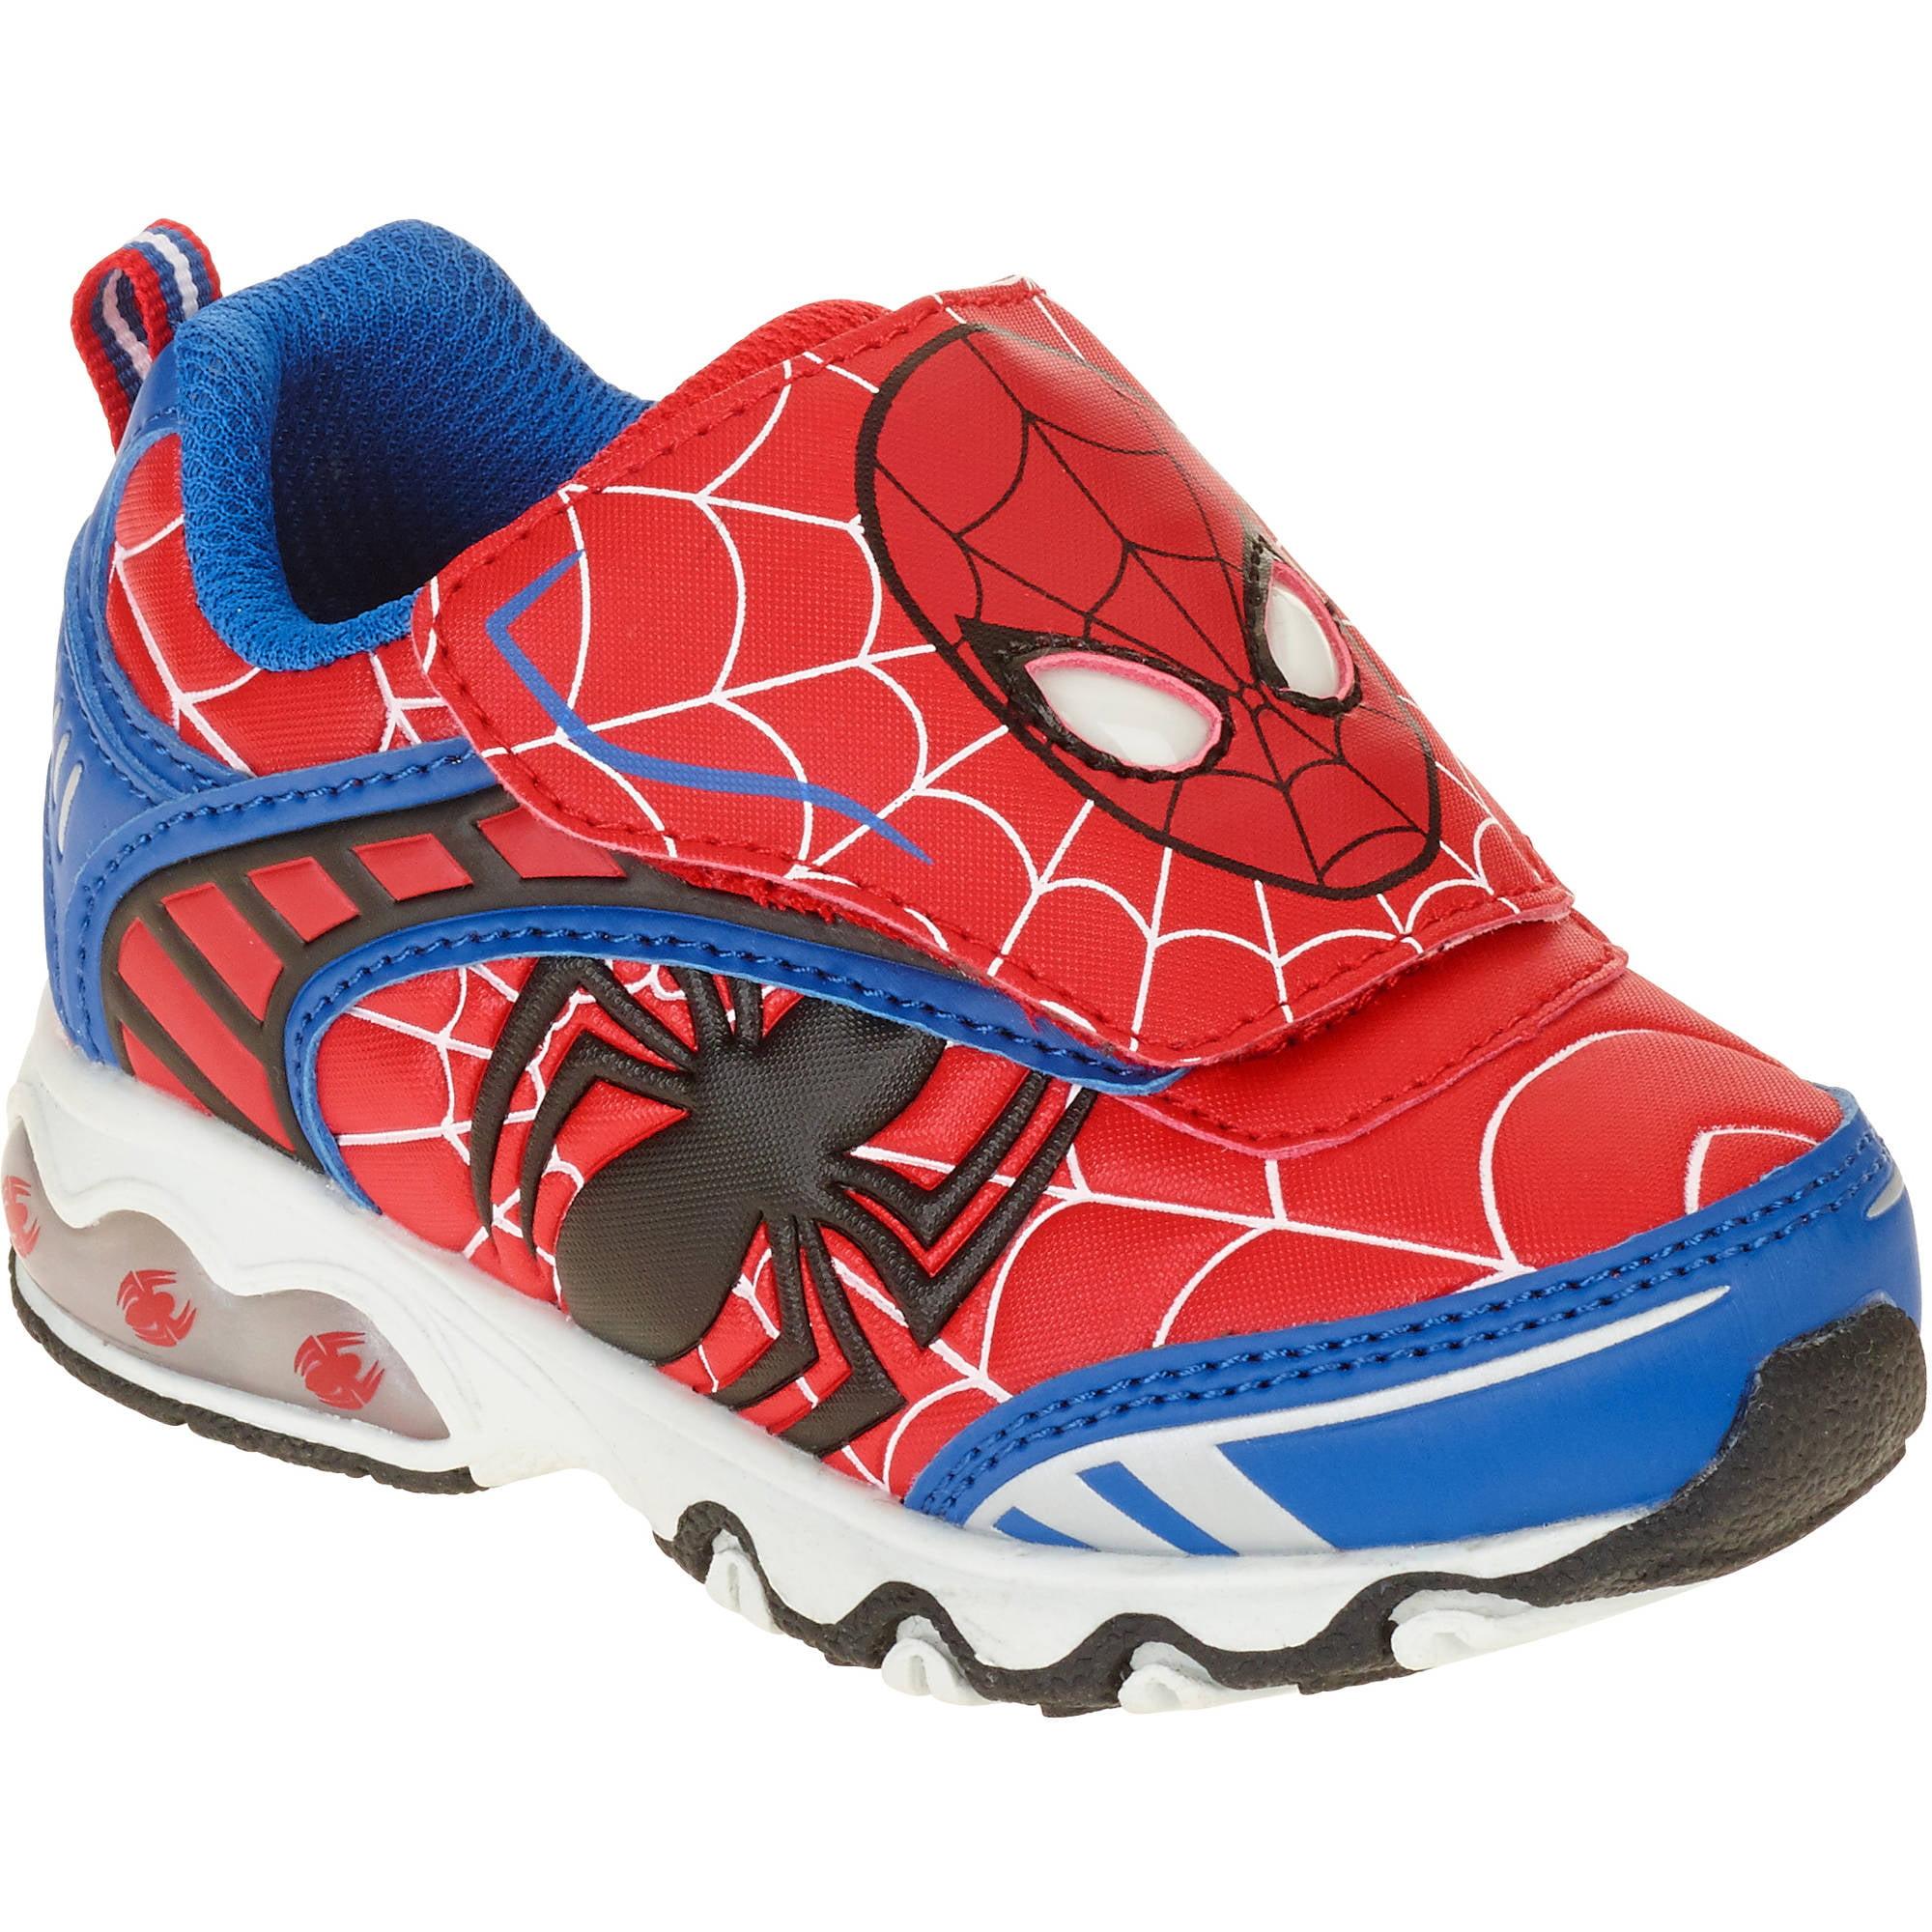 Spider-Man Toddler Boys' Athletic Shoe